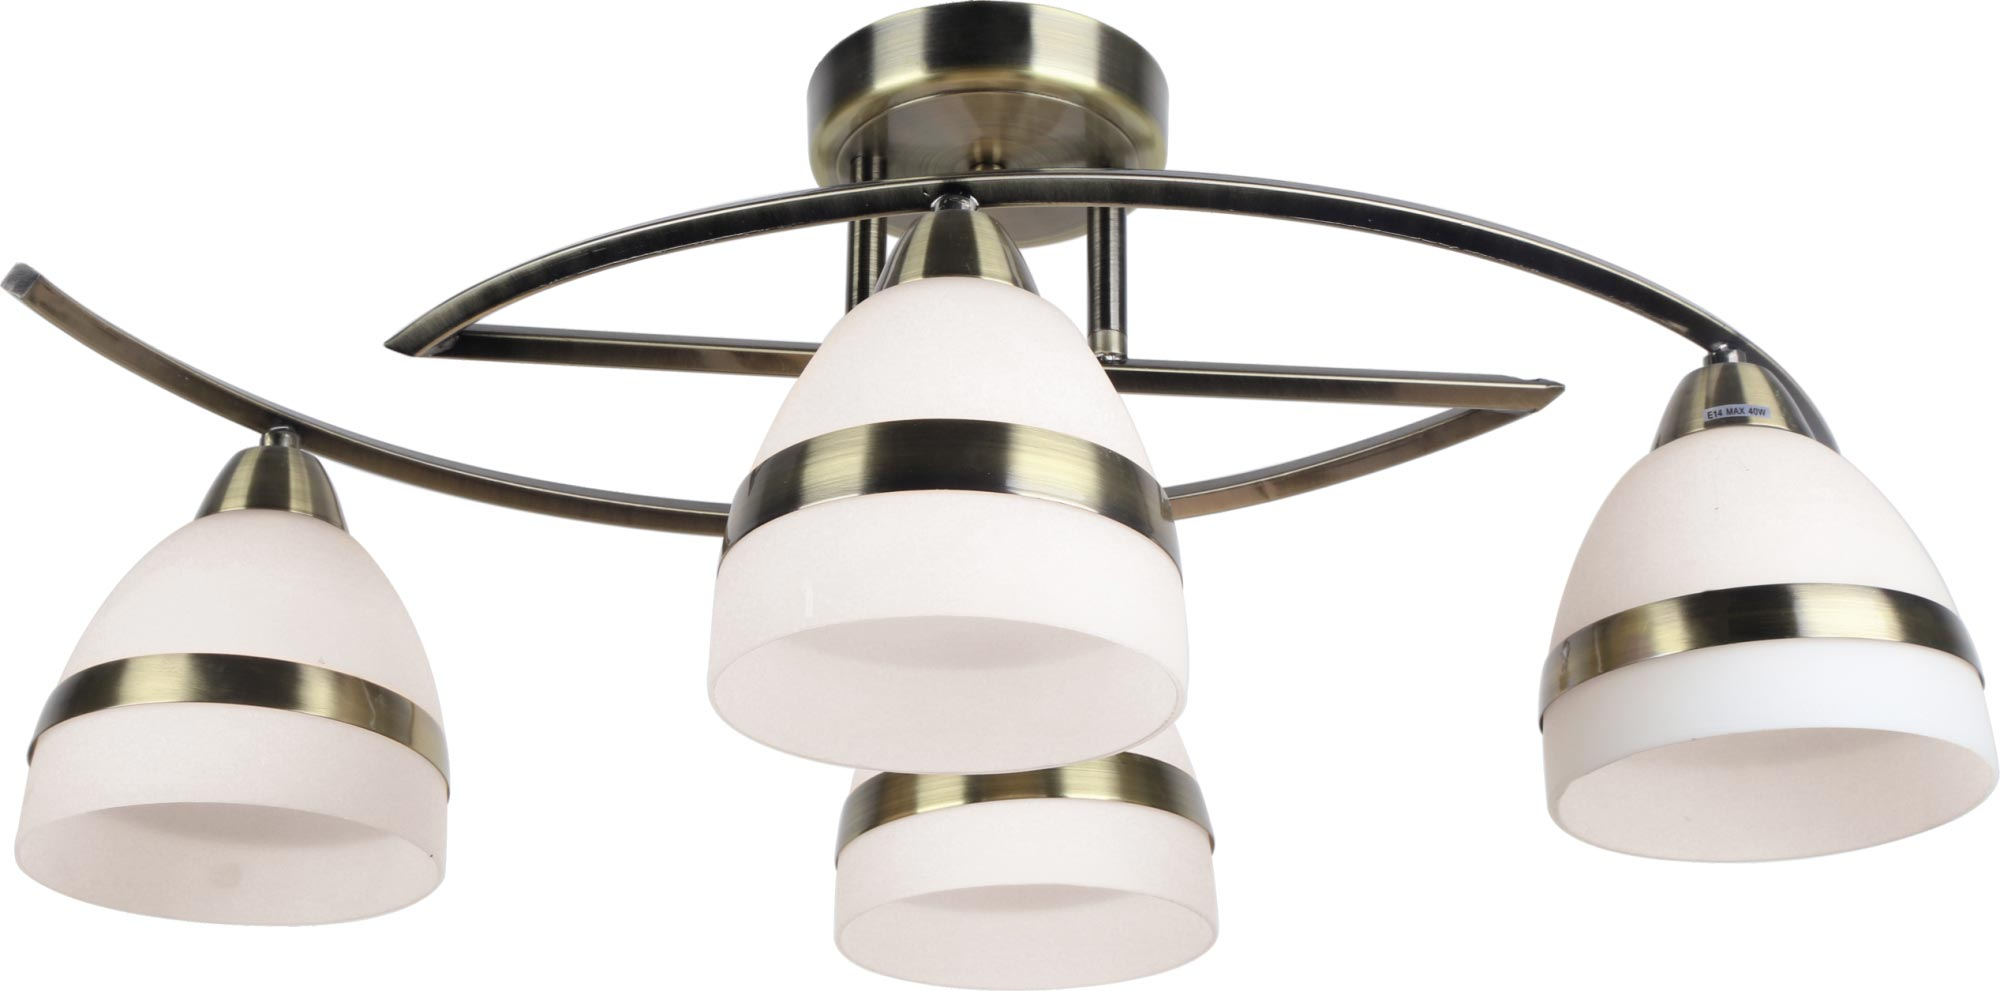 Lampa sufitowa K-JSL-6572/4 AB z serii COLAR